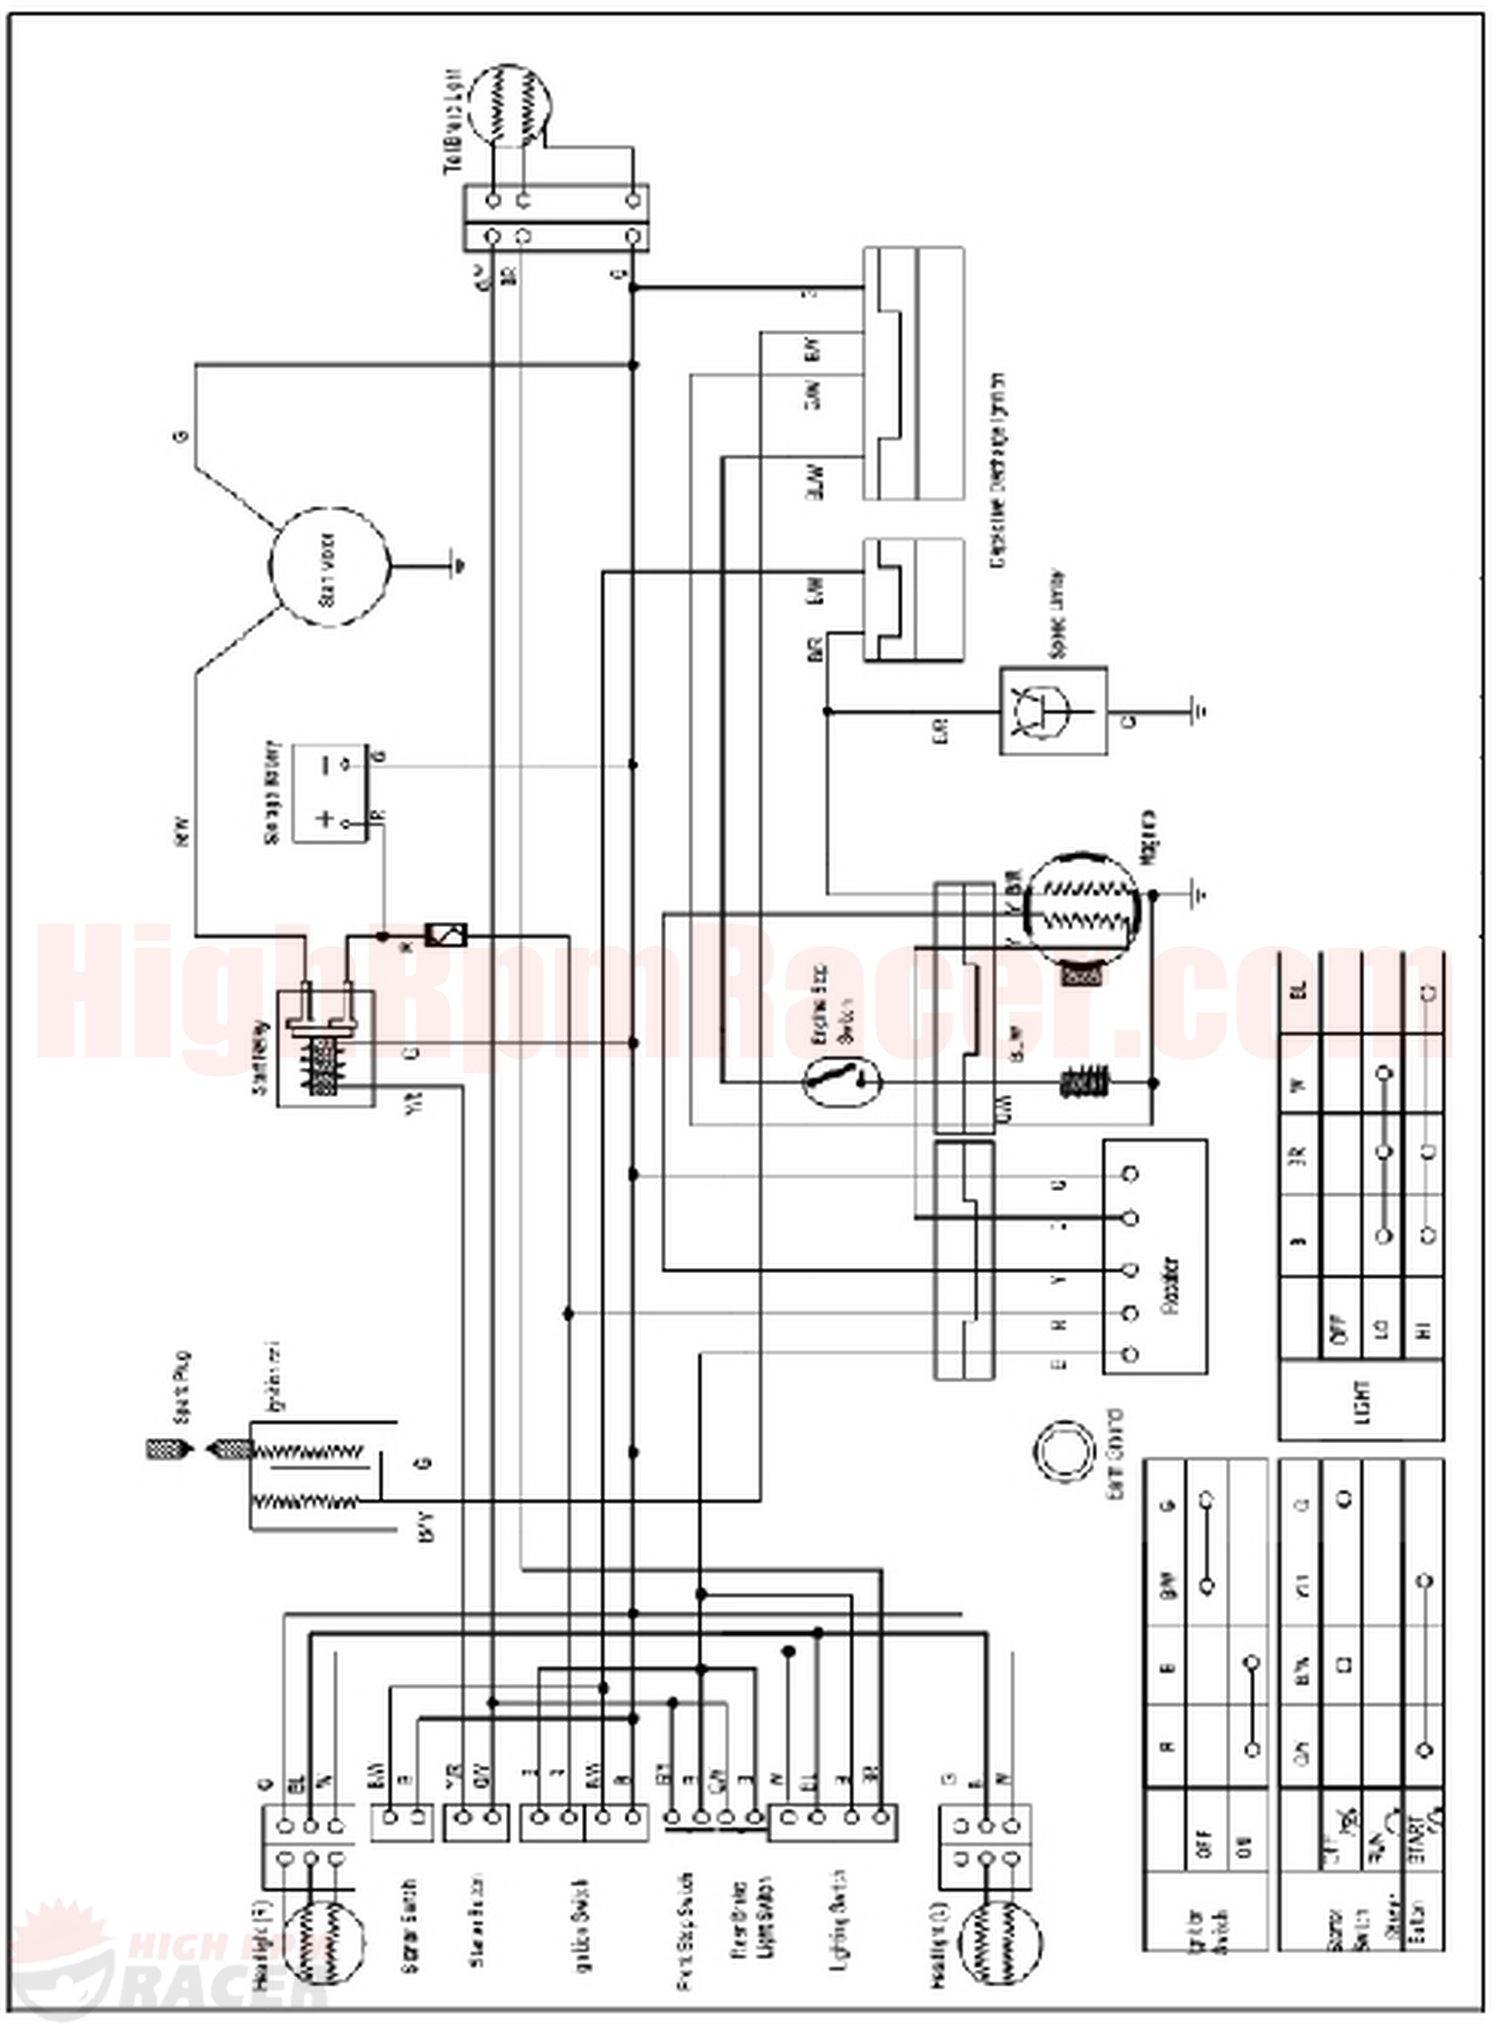 Amazing 250 Atv Wiring Schematics Wiring Diagram Wiring Cloud Licukshollocom